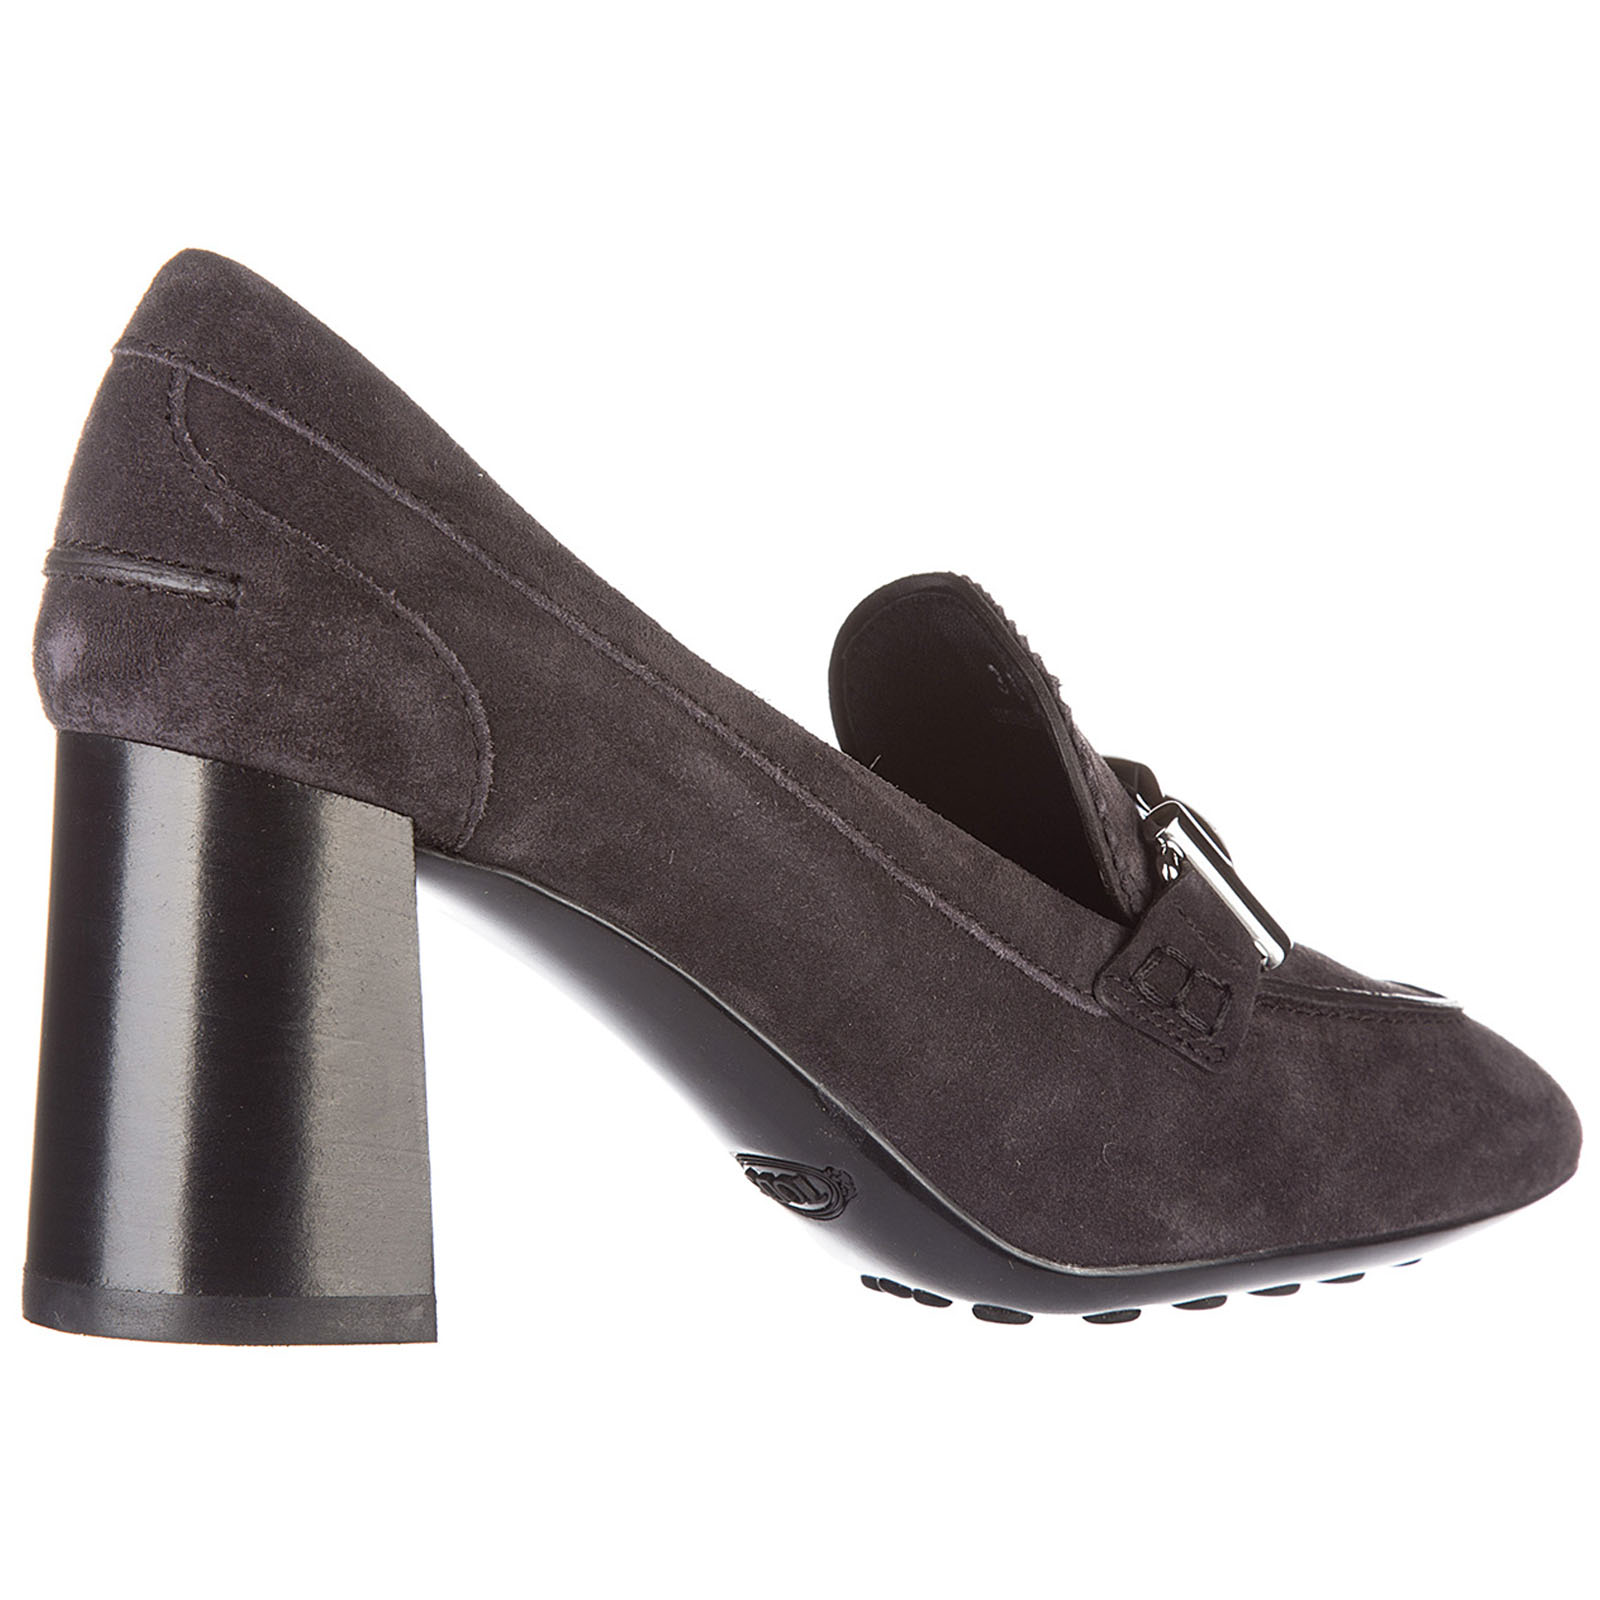 туфли-декольте женские на каблуке замшевые double t